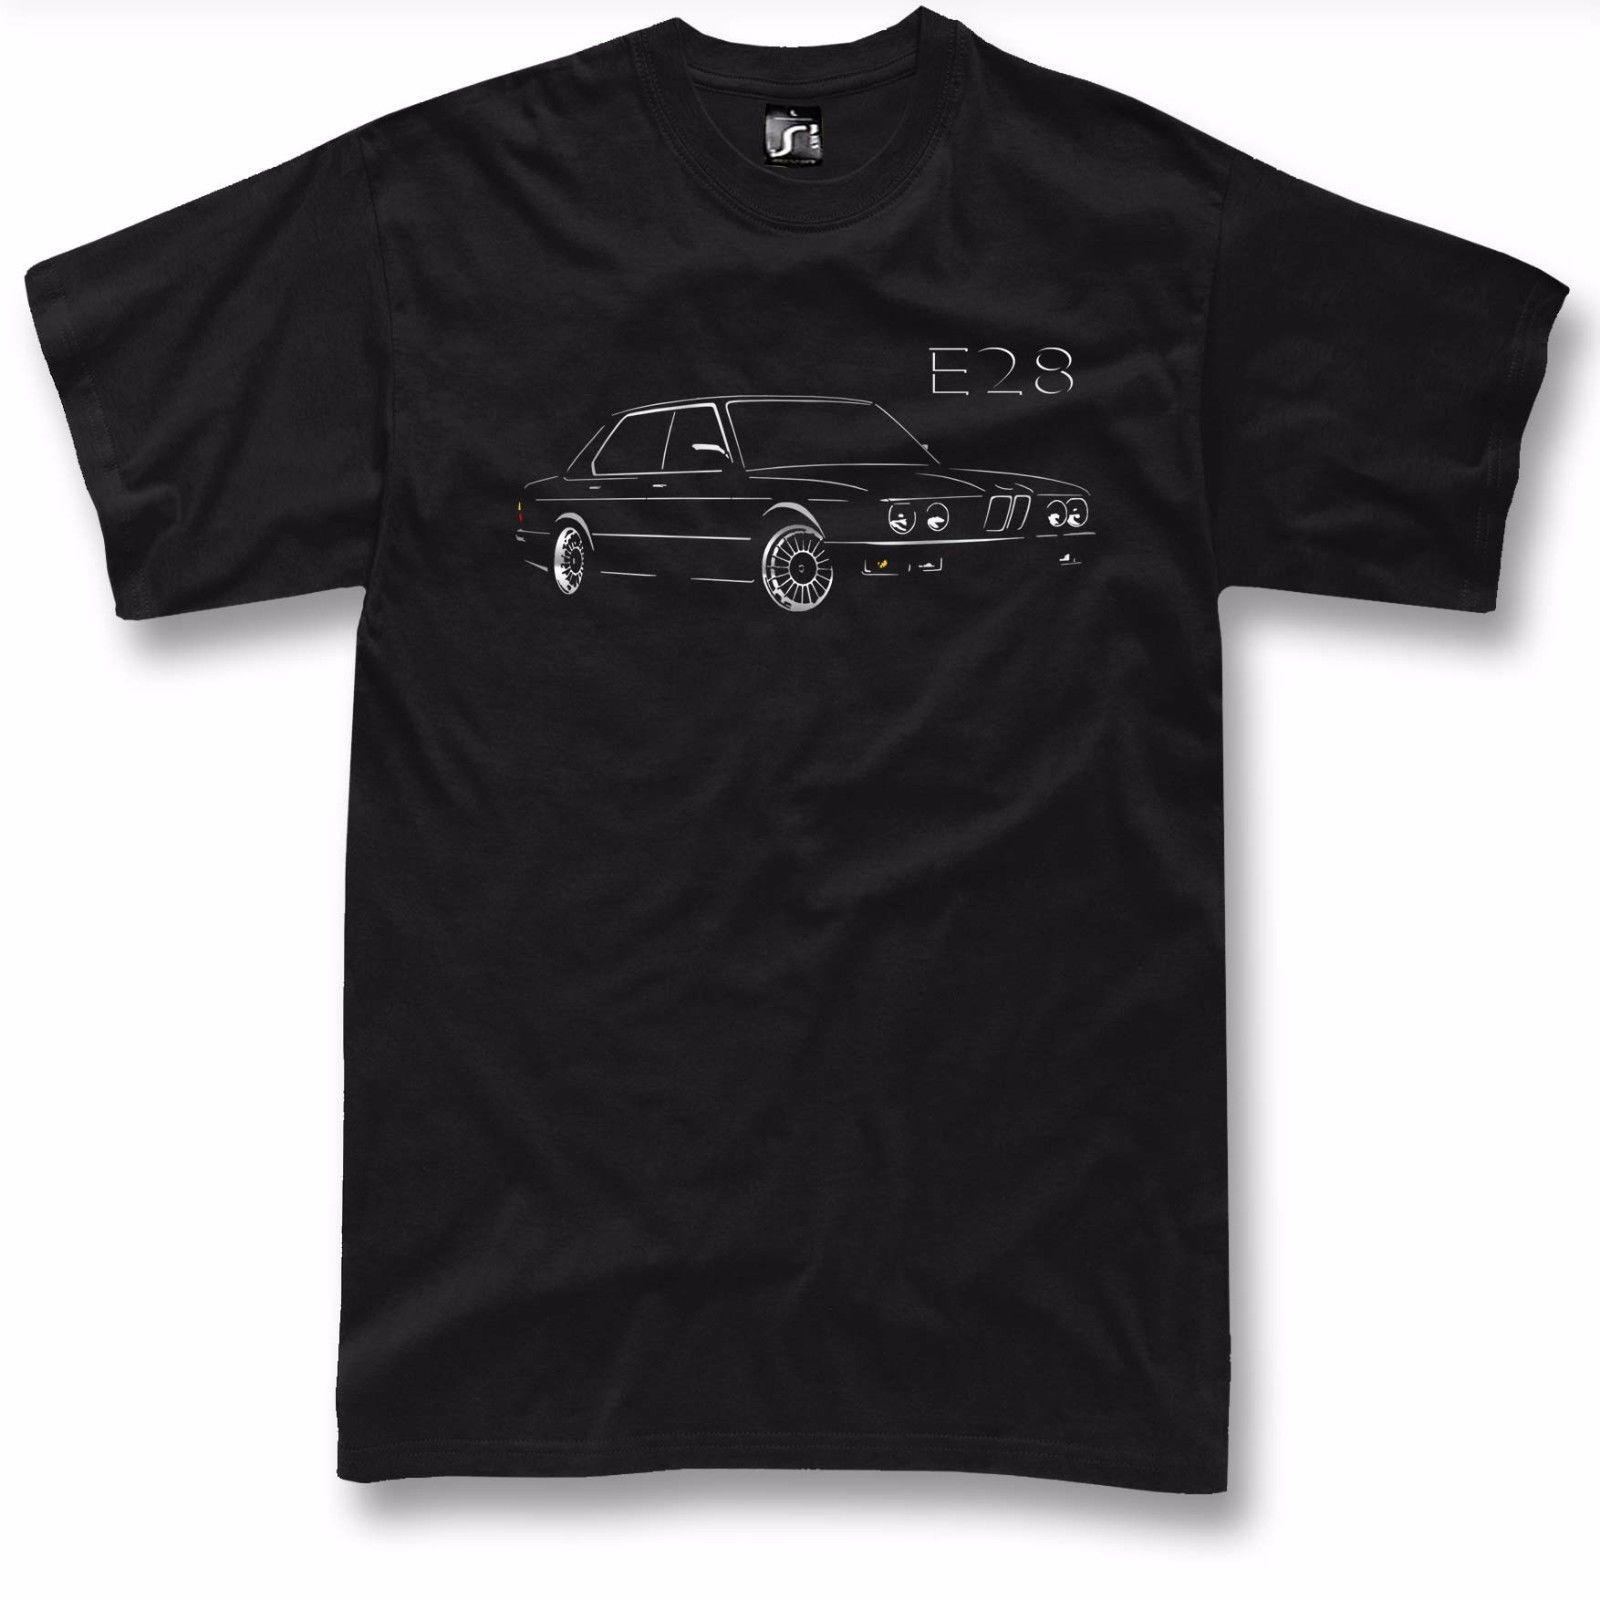 E28 T Shirt 520 525 528 535 M5 For Cheap Hot Sale E28 Fans 5 Series